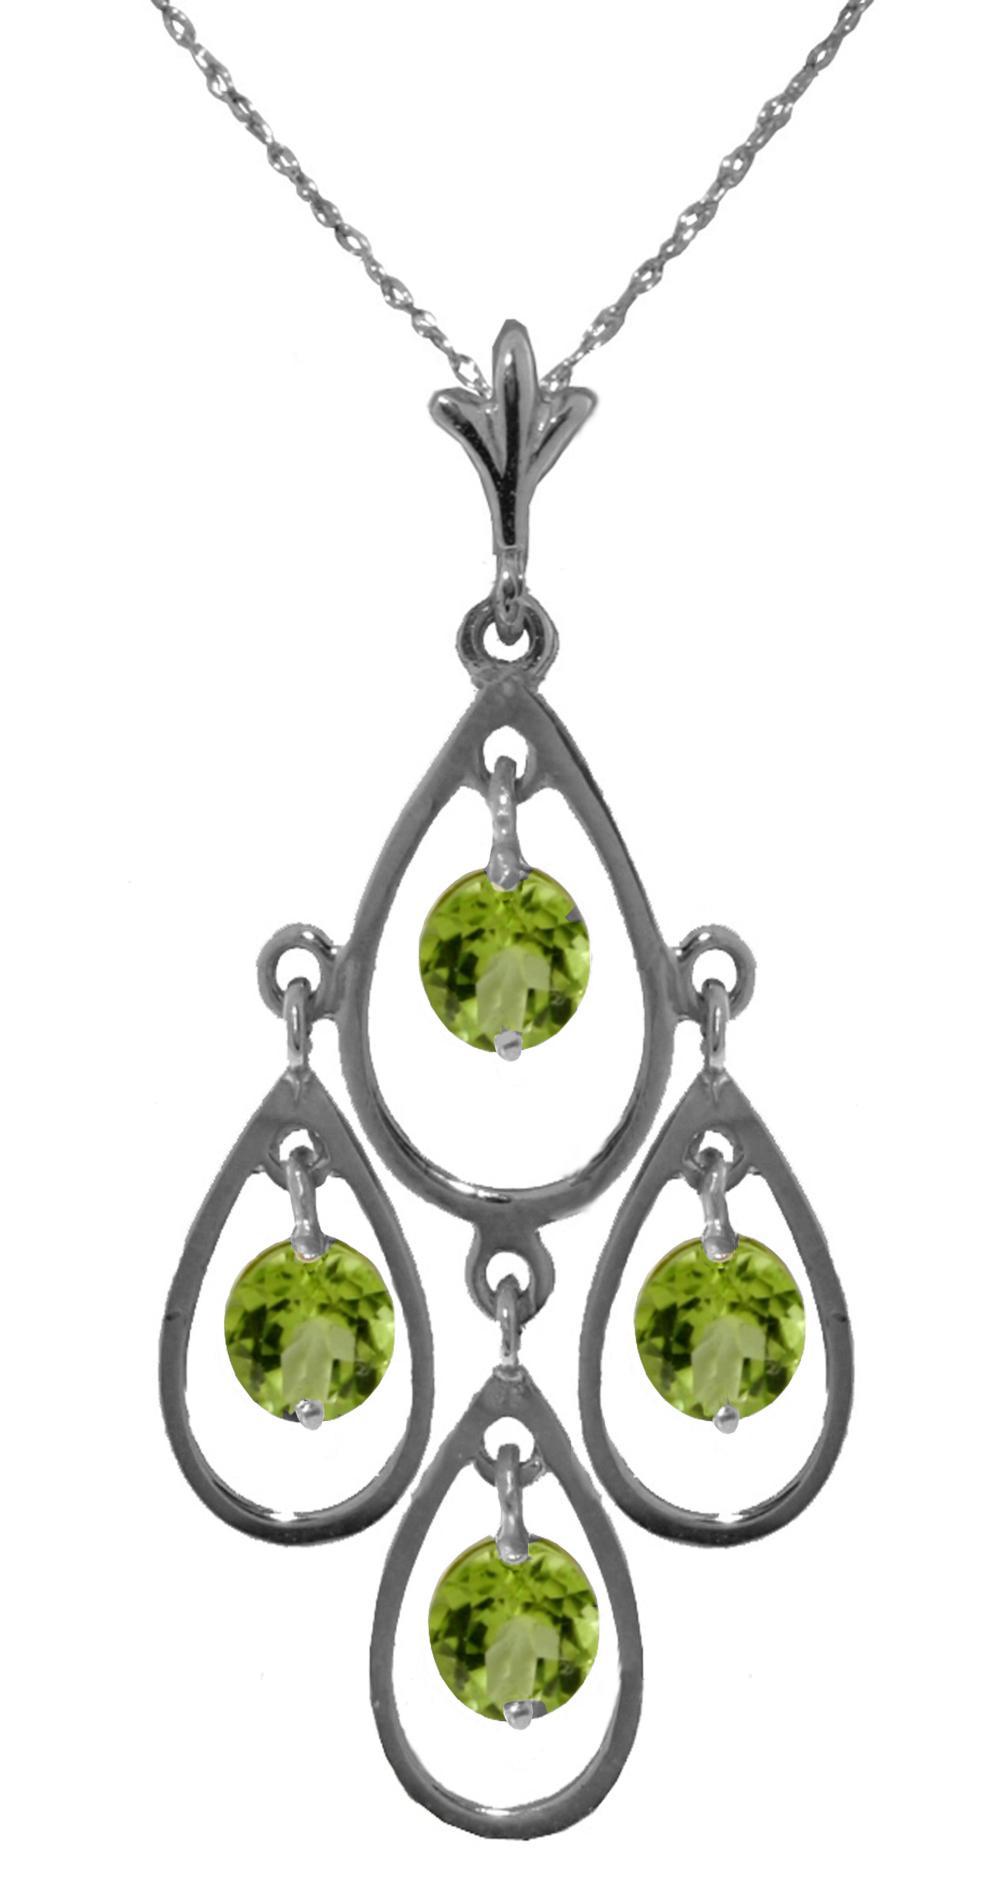 Genuine 1.20 ctw Peridot Necklace Jewelry 14KT White Gold - REF-30K7V